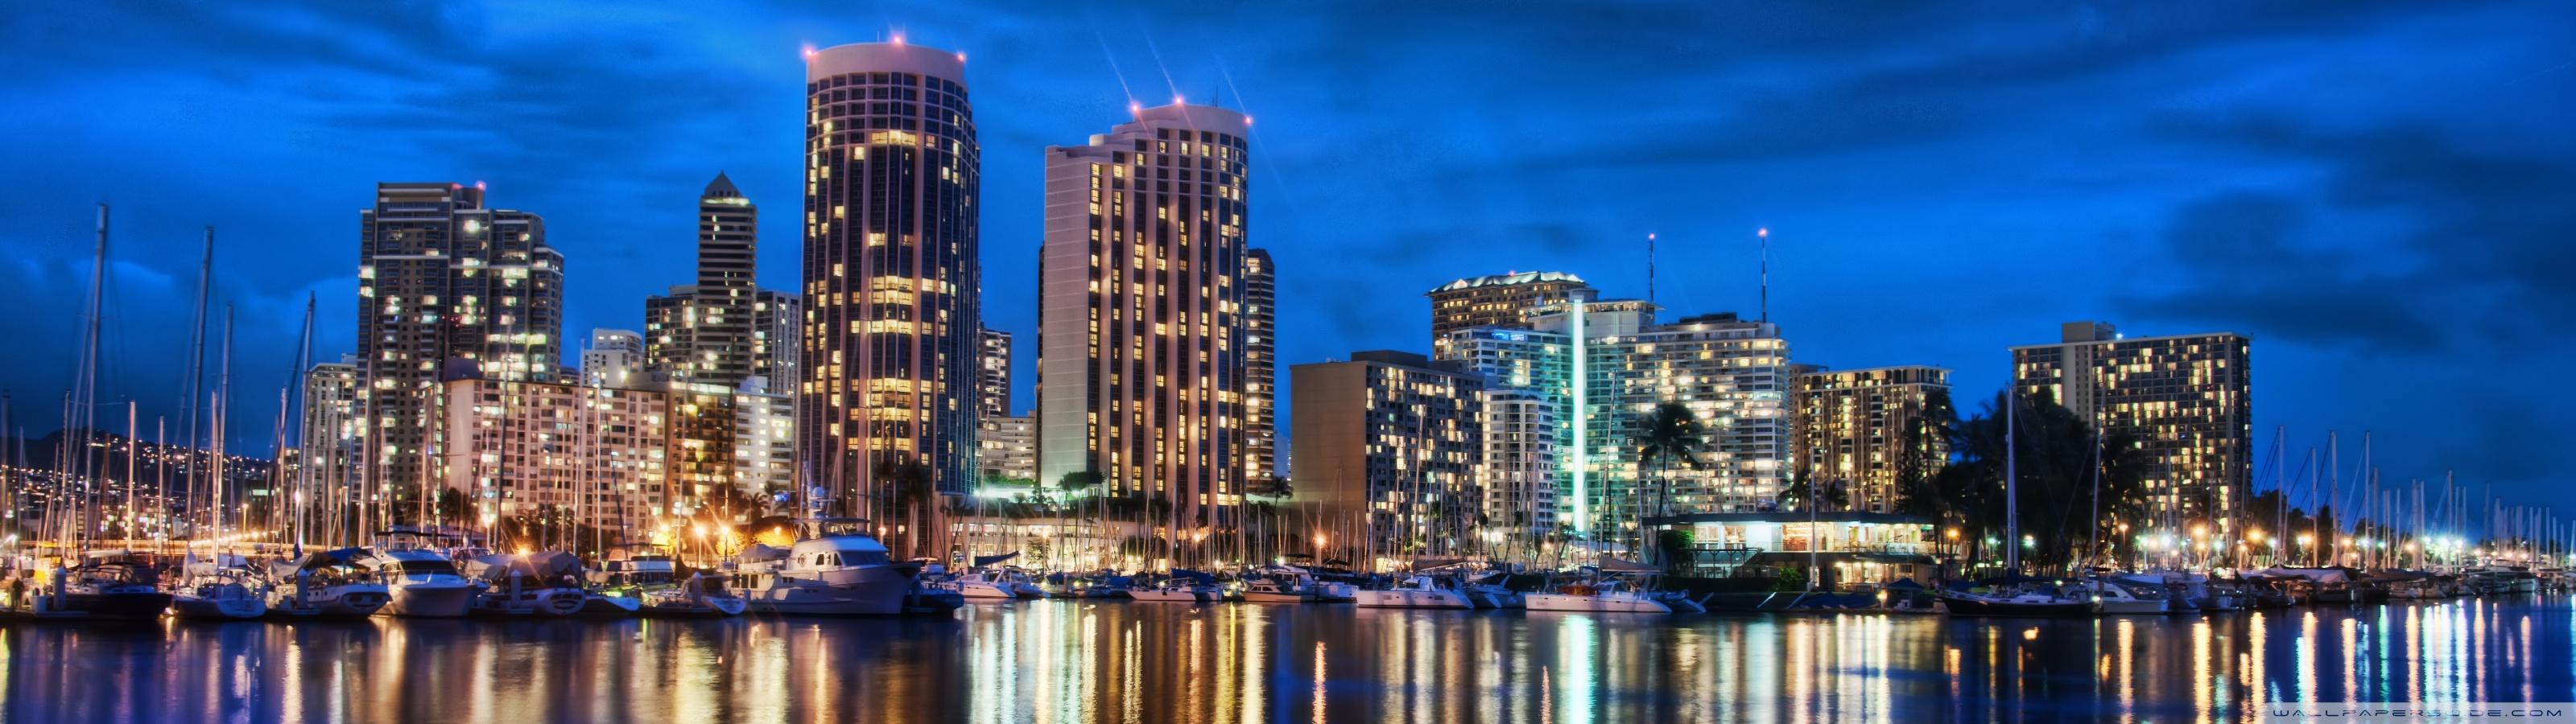 Waikiki Skyline At Night 4K HD Desktop Wallpaper for 4K Ultra 3200x900